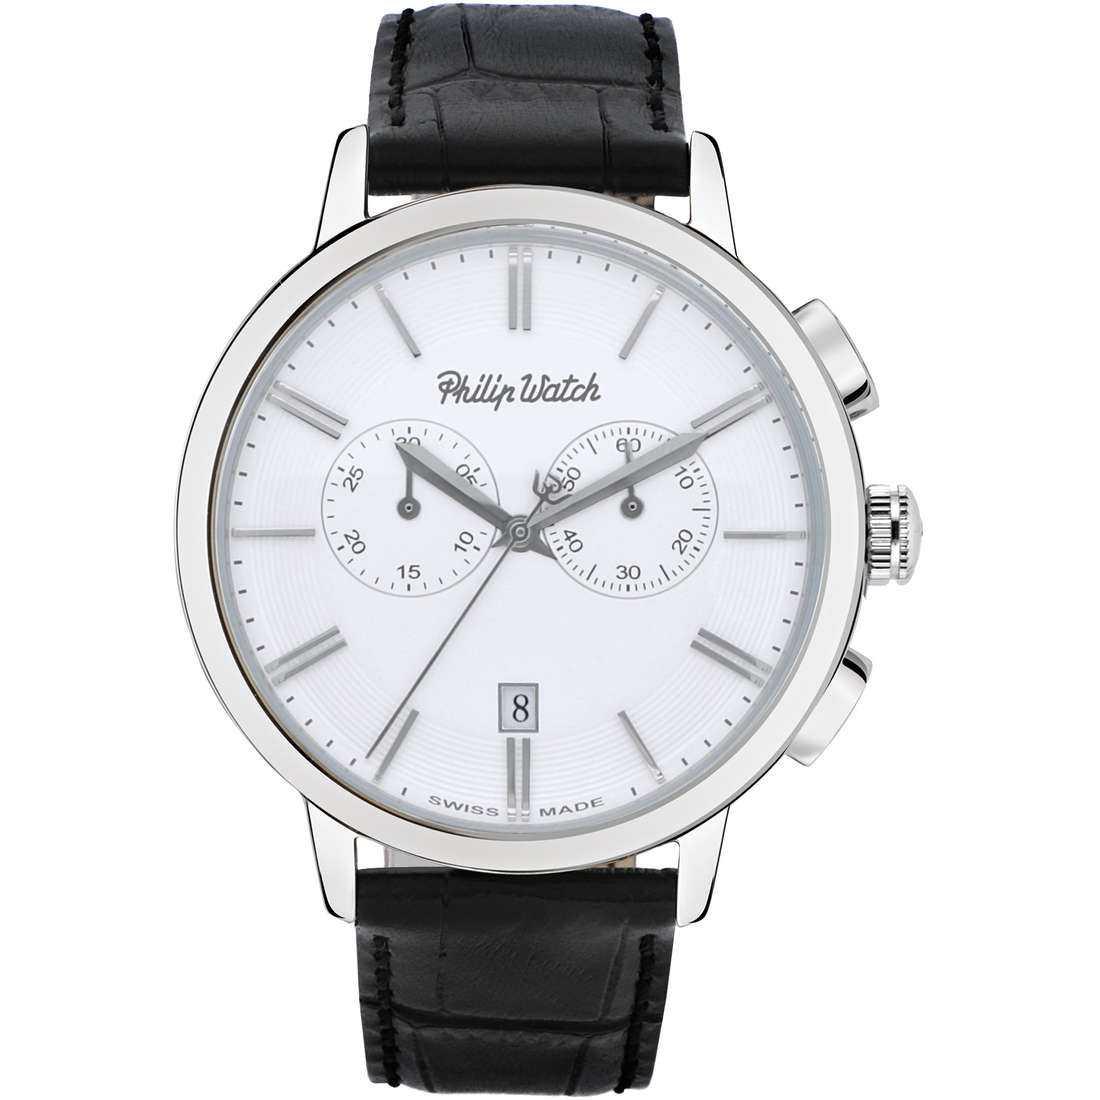 Orologio philip watch r8271698007